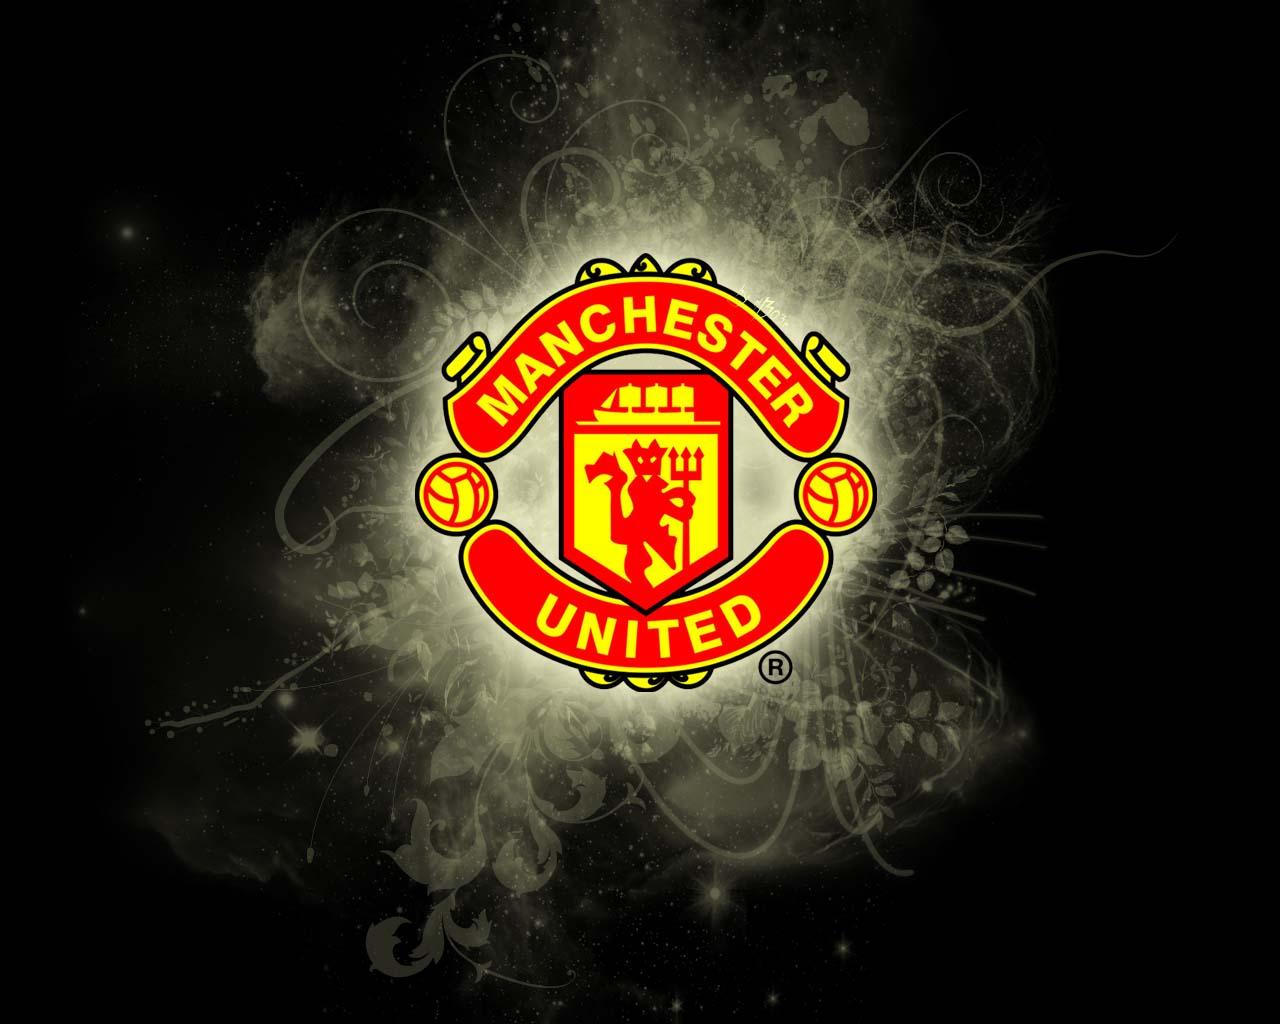 Free Gambar Wallpaper Manchester United1 [